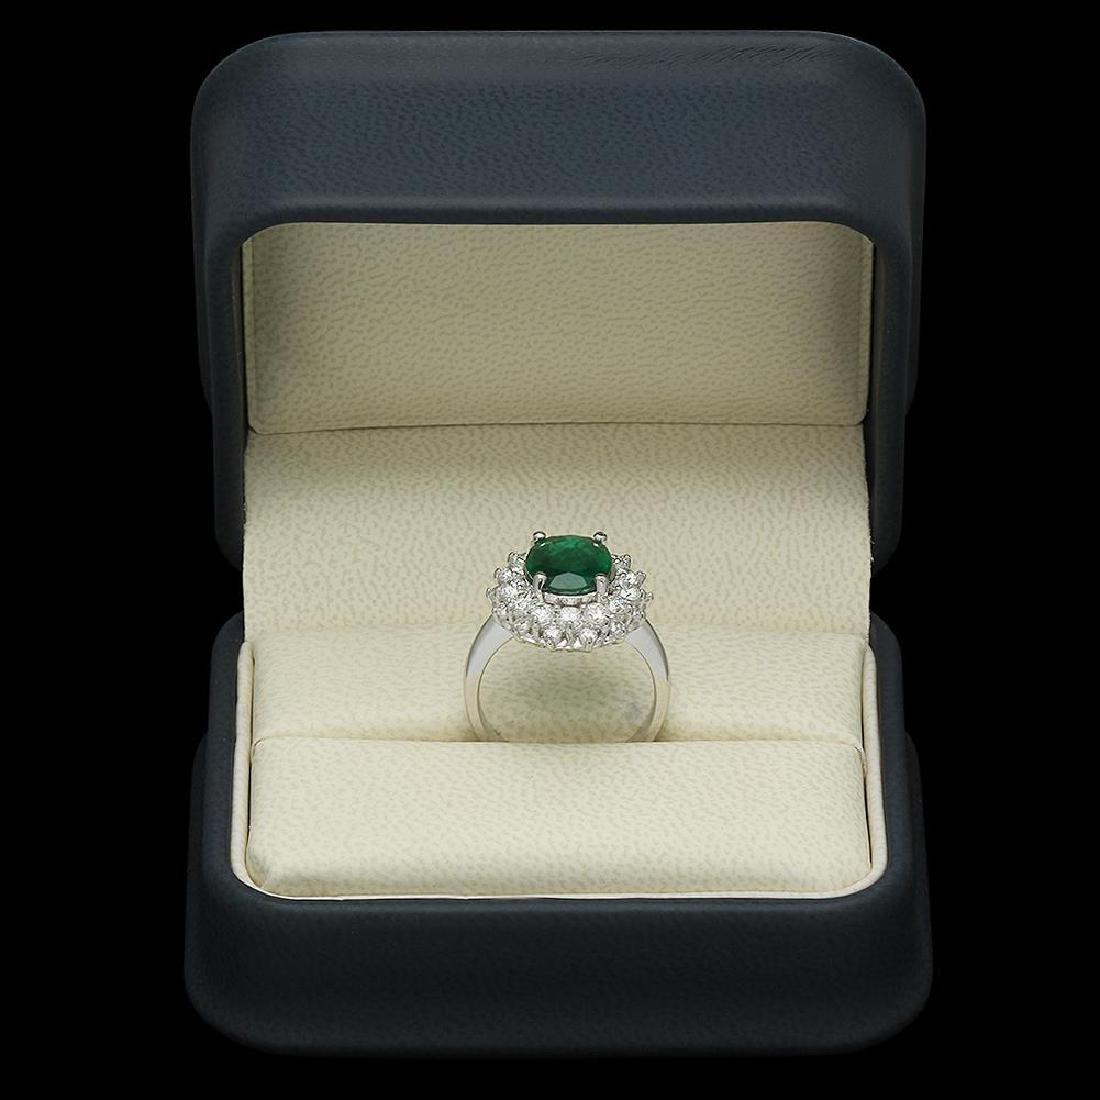 14K Gold 2.08ct Emerald 1.59ct Diamond Ring - 4